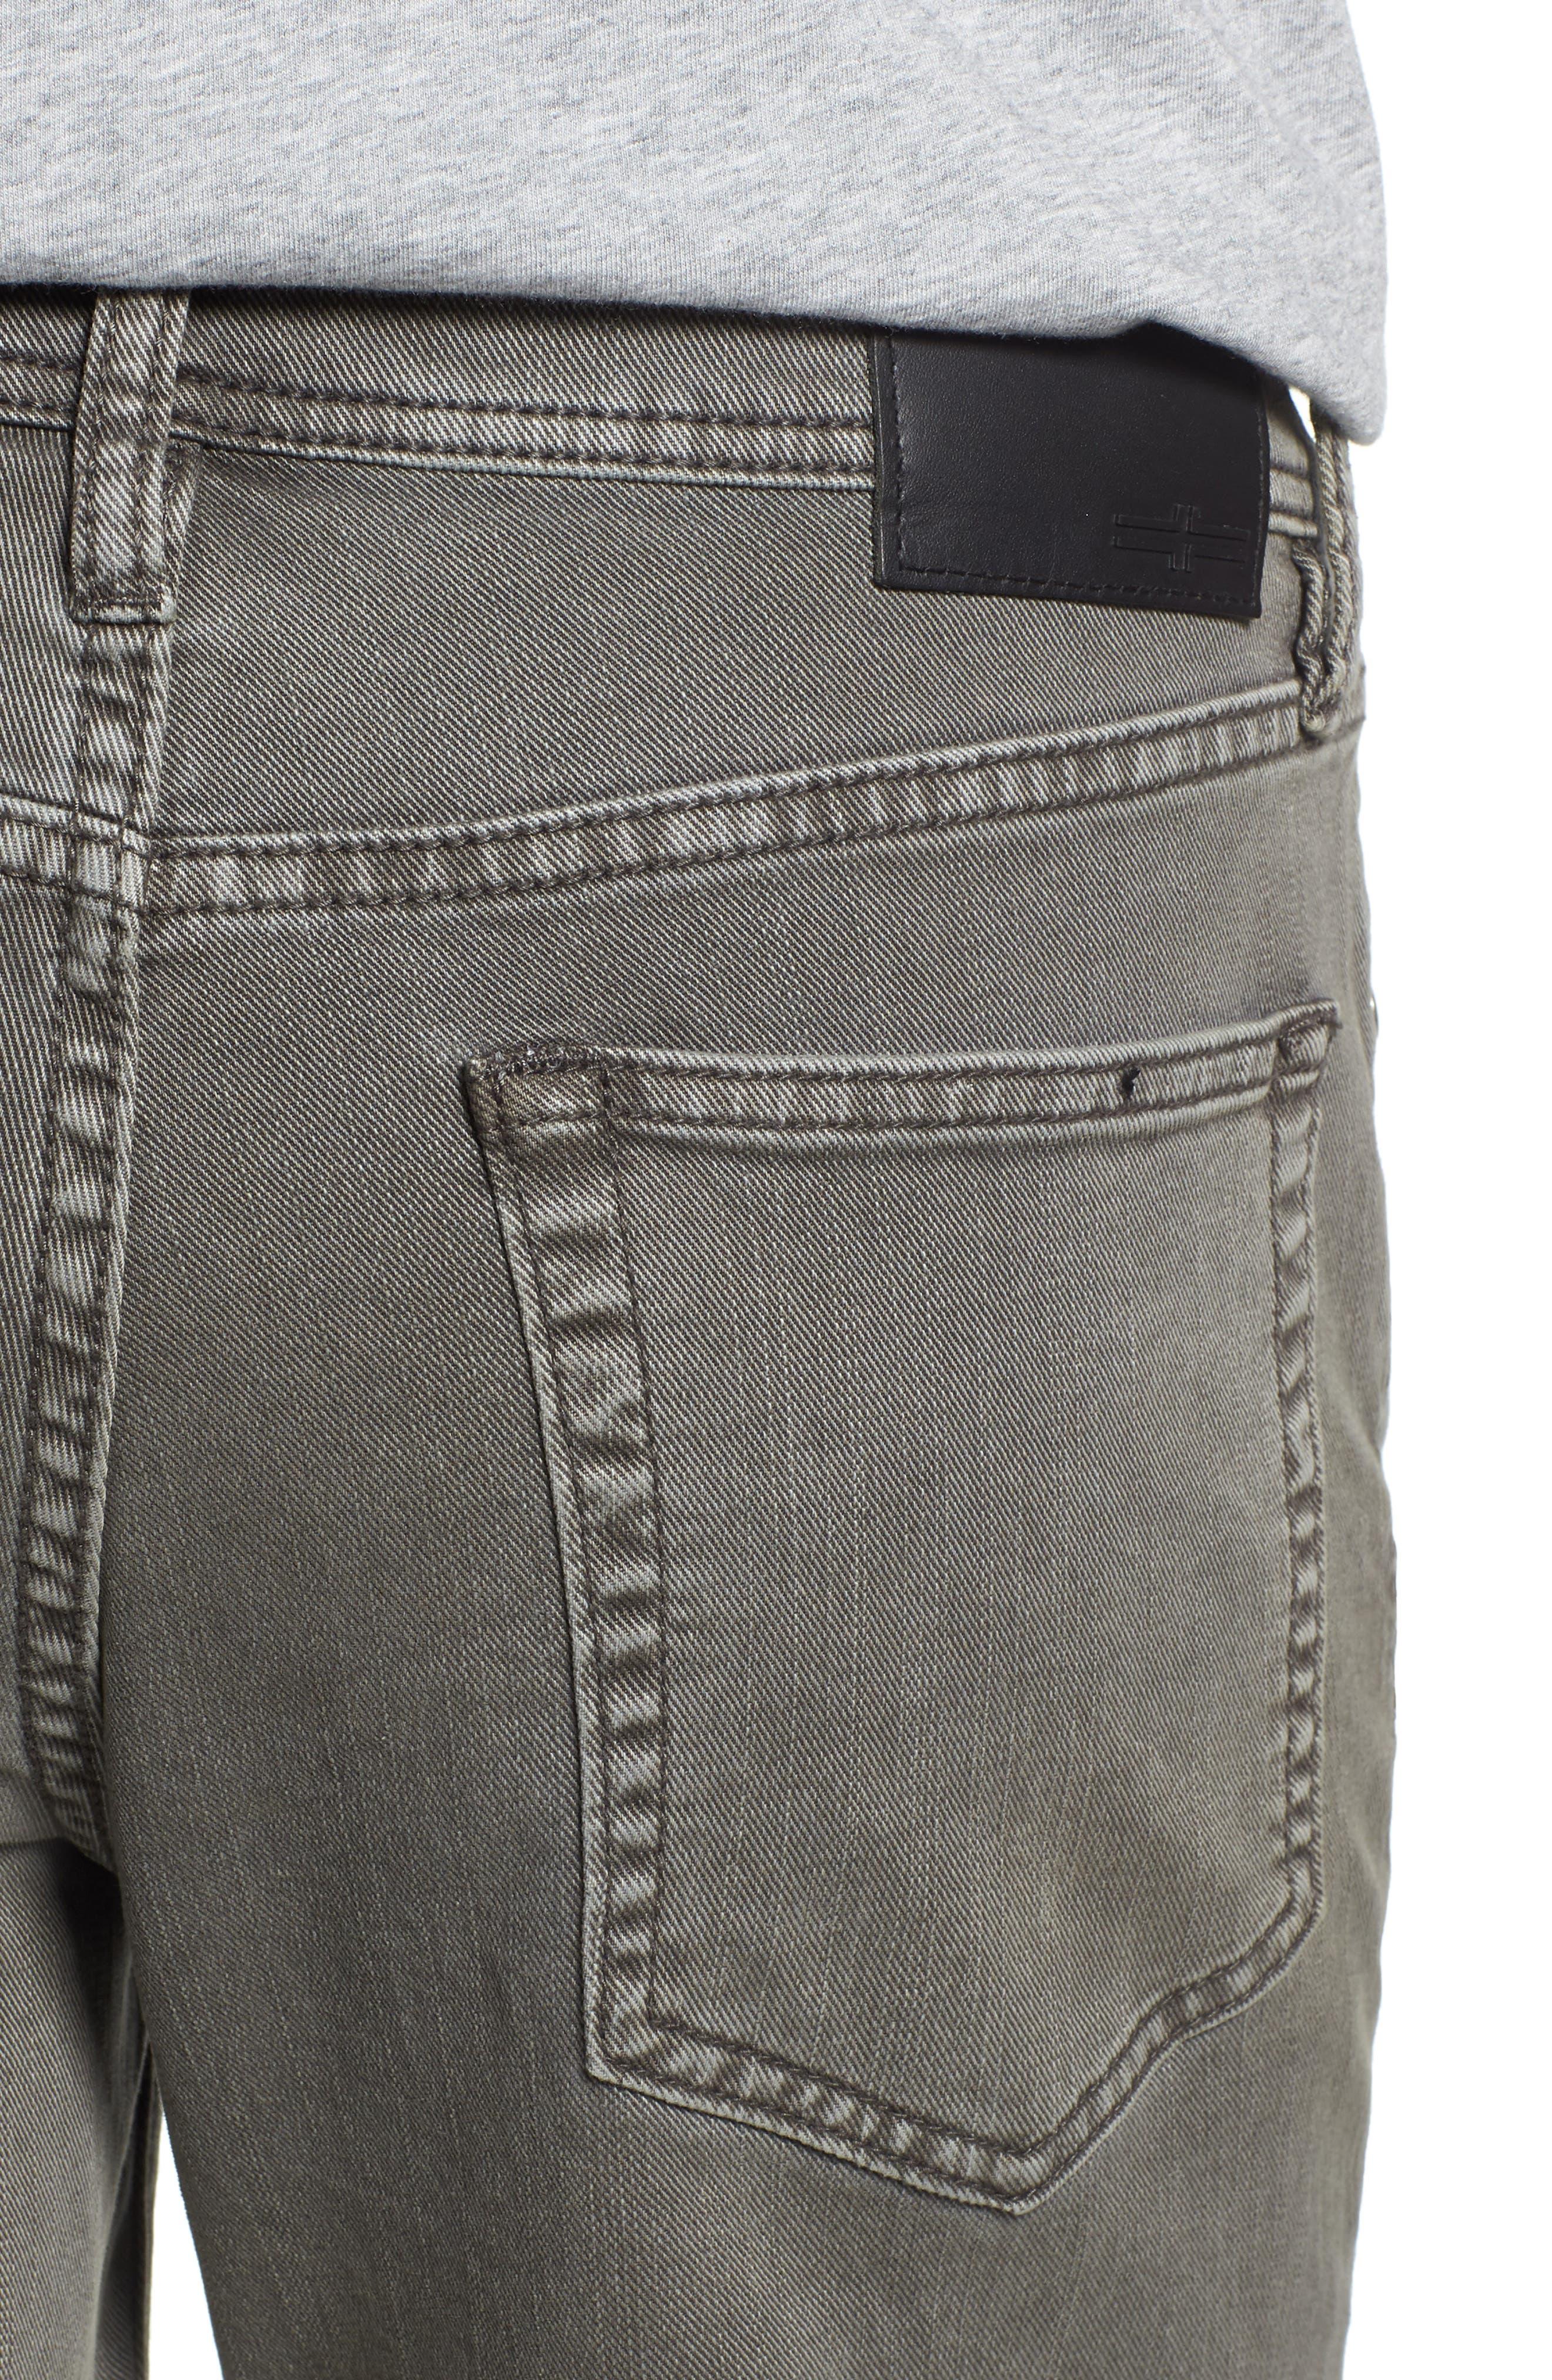 Regent Relaxed Fit Jeans,                             Alternate thumbnail 4, color,                             GUNMETAL